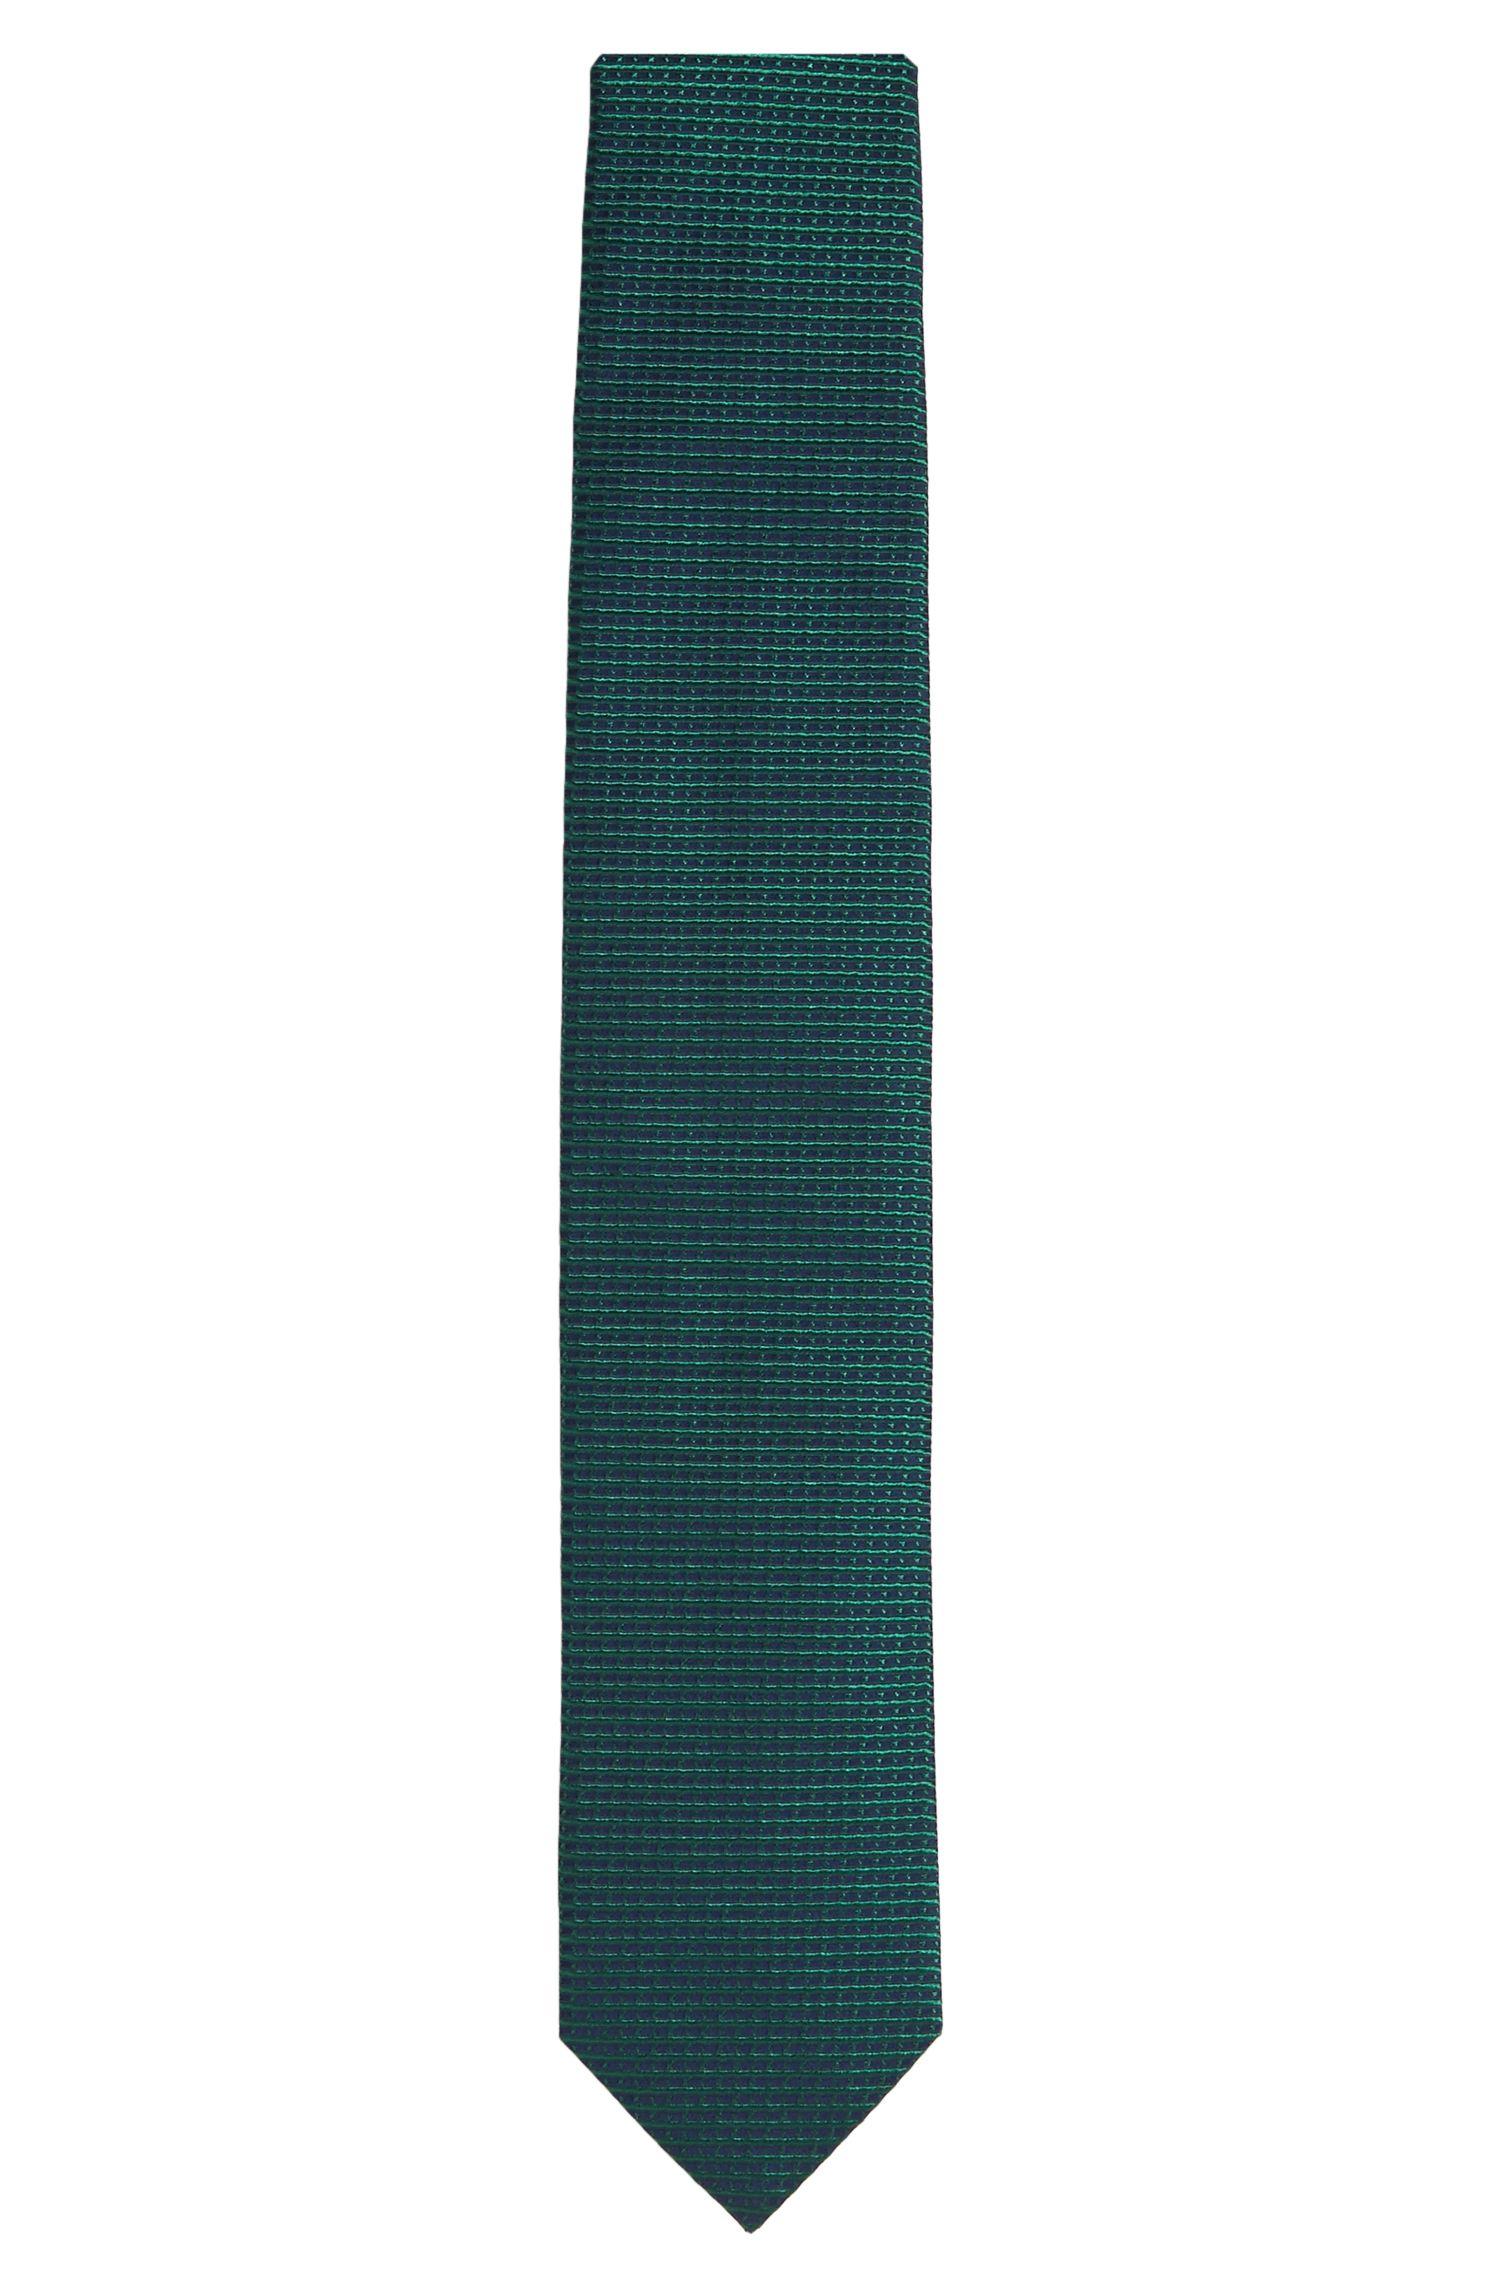 'Tie 7 cm' | Regular, Italian Silk Embroidered Tie